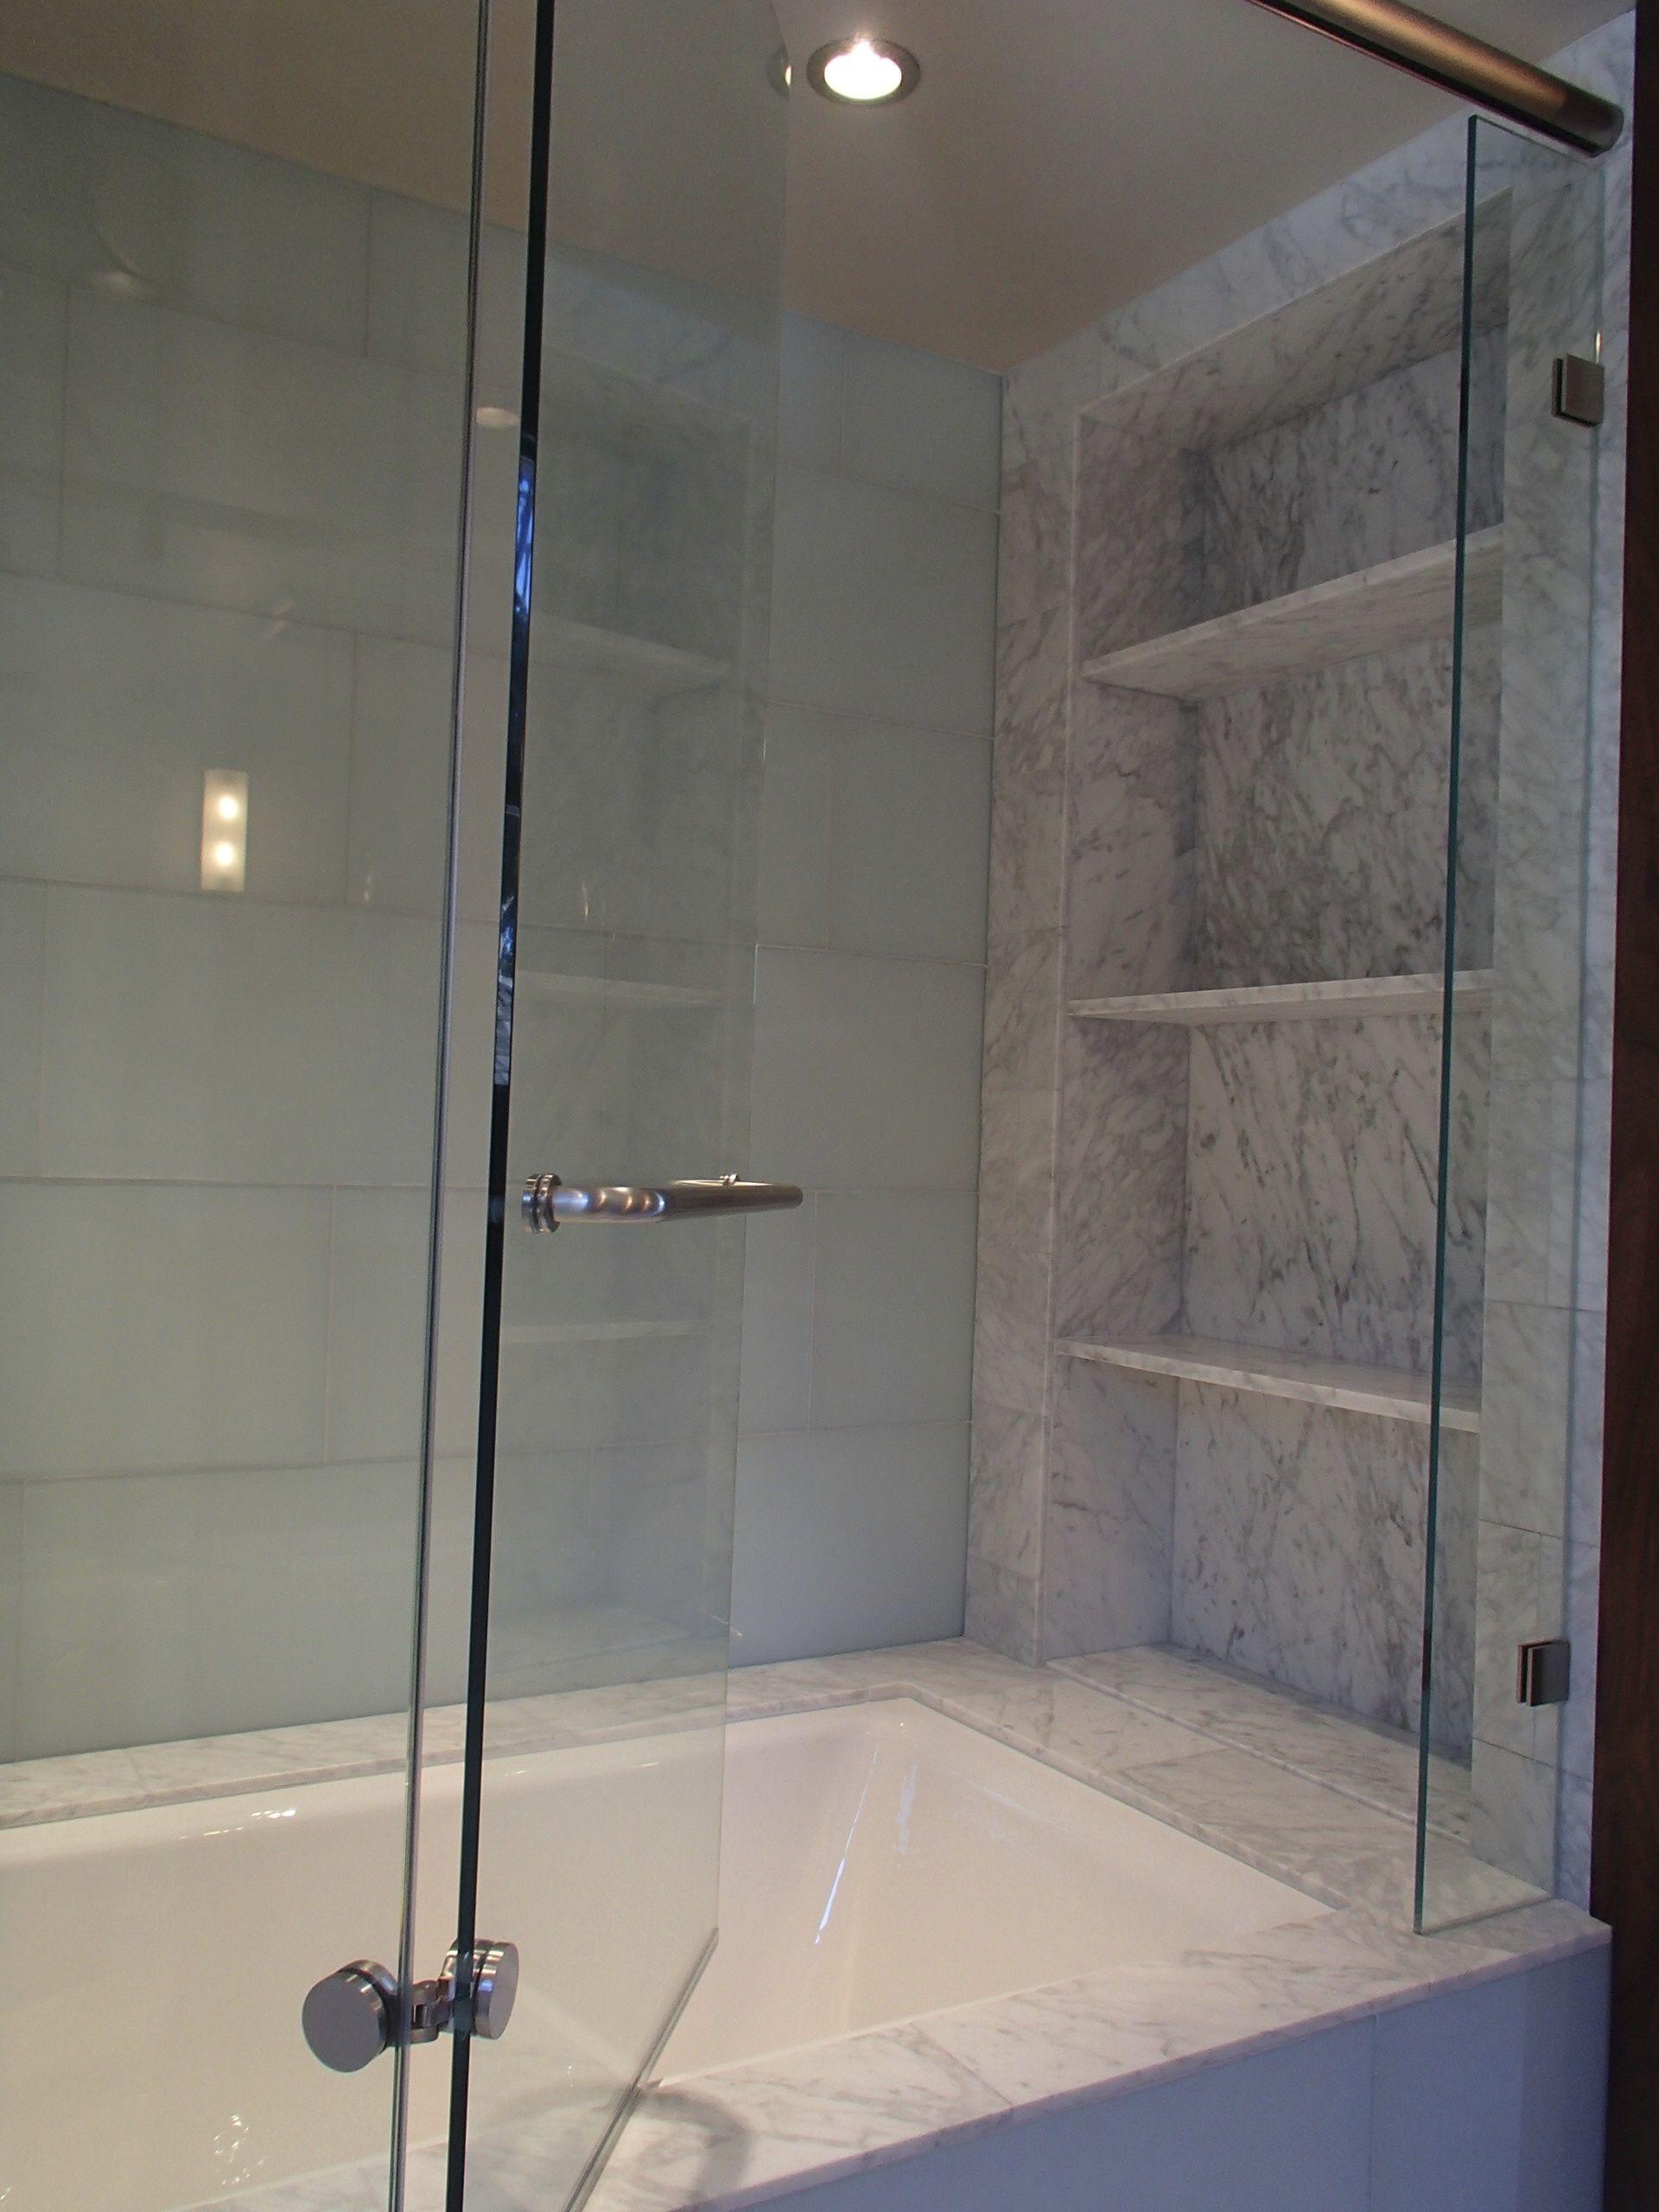 Carrara Marble Slab Tub Deck, Carrara Marble Tile By Ann Sacks. Kohler Tub.  Polished Nickel Faucet And Fixtures By Restoration Hardware.